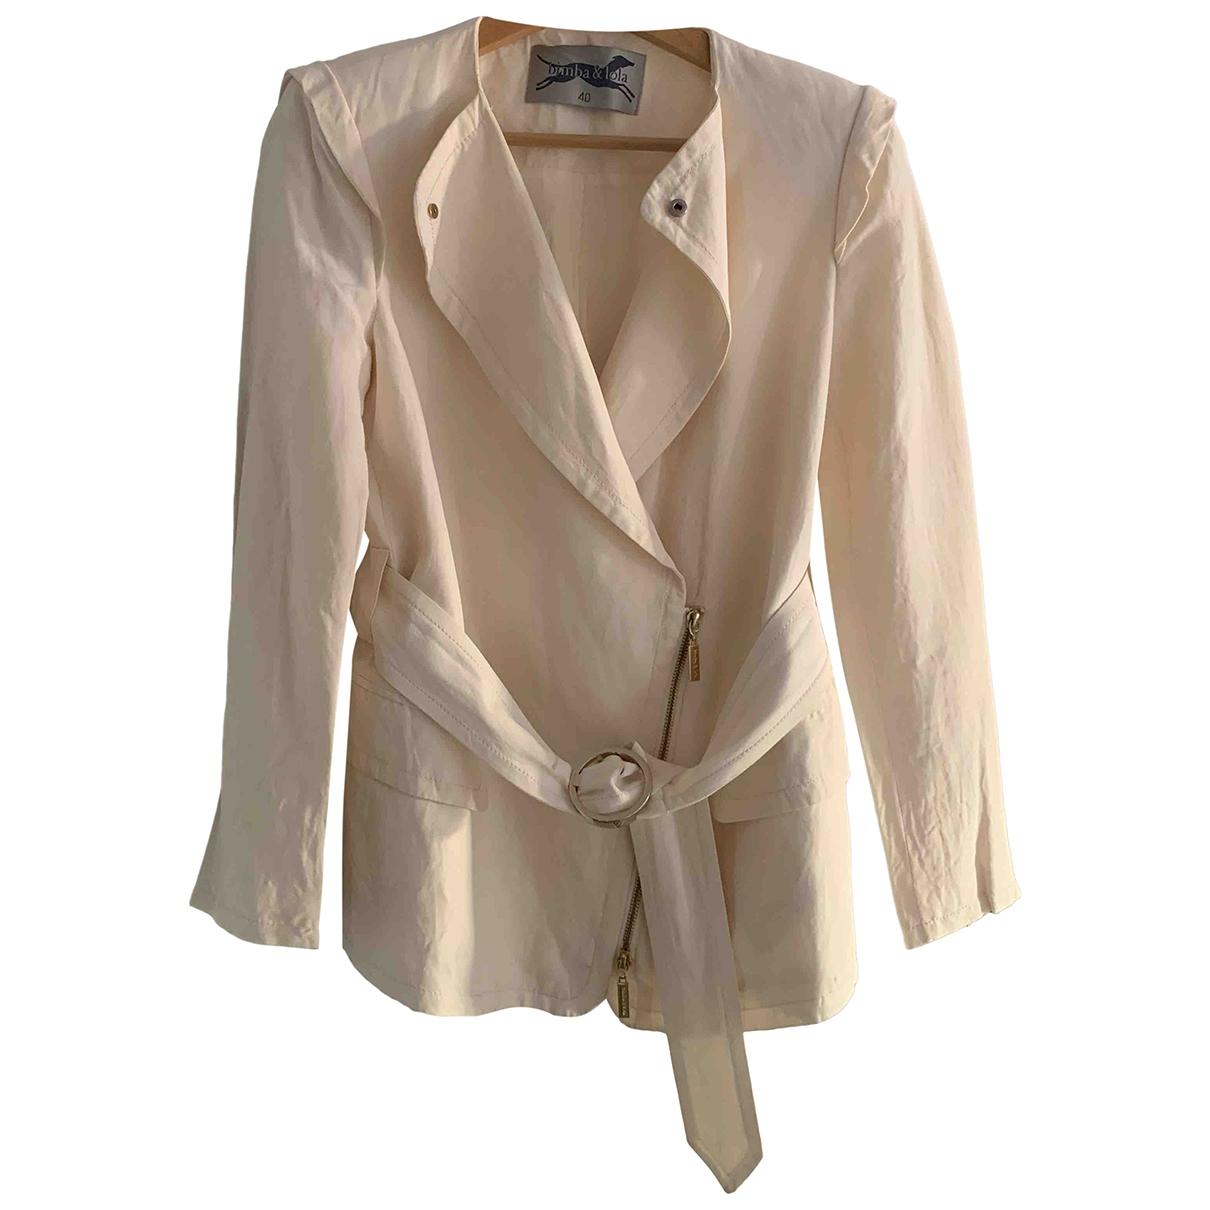 Bimba Y Lola \N Ecru jacket for Women 40 FR